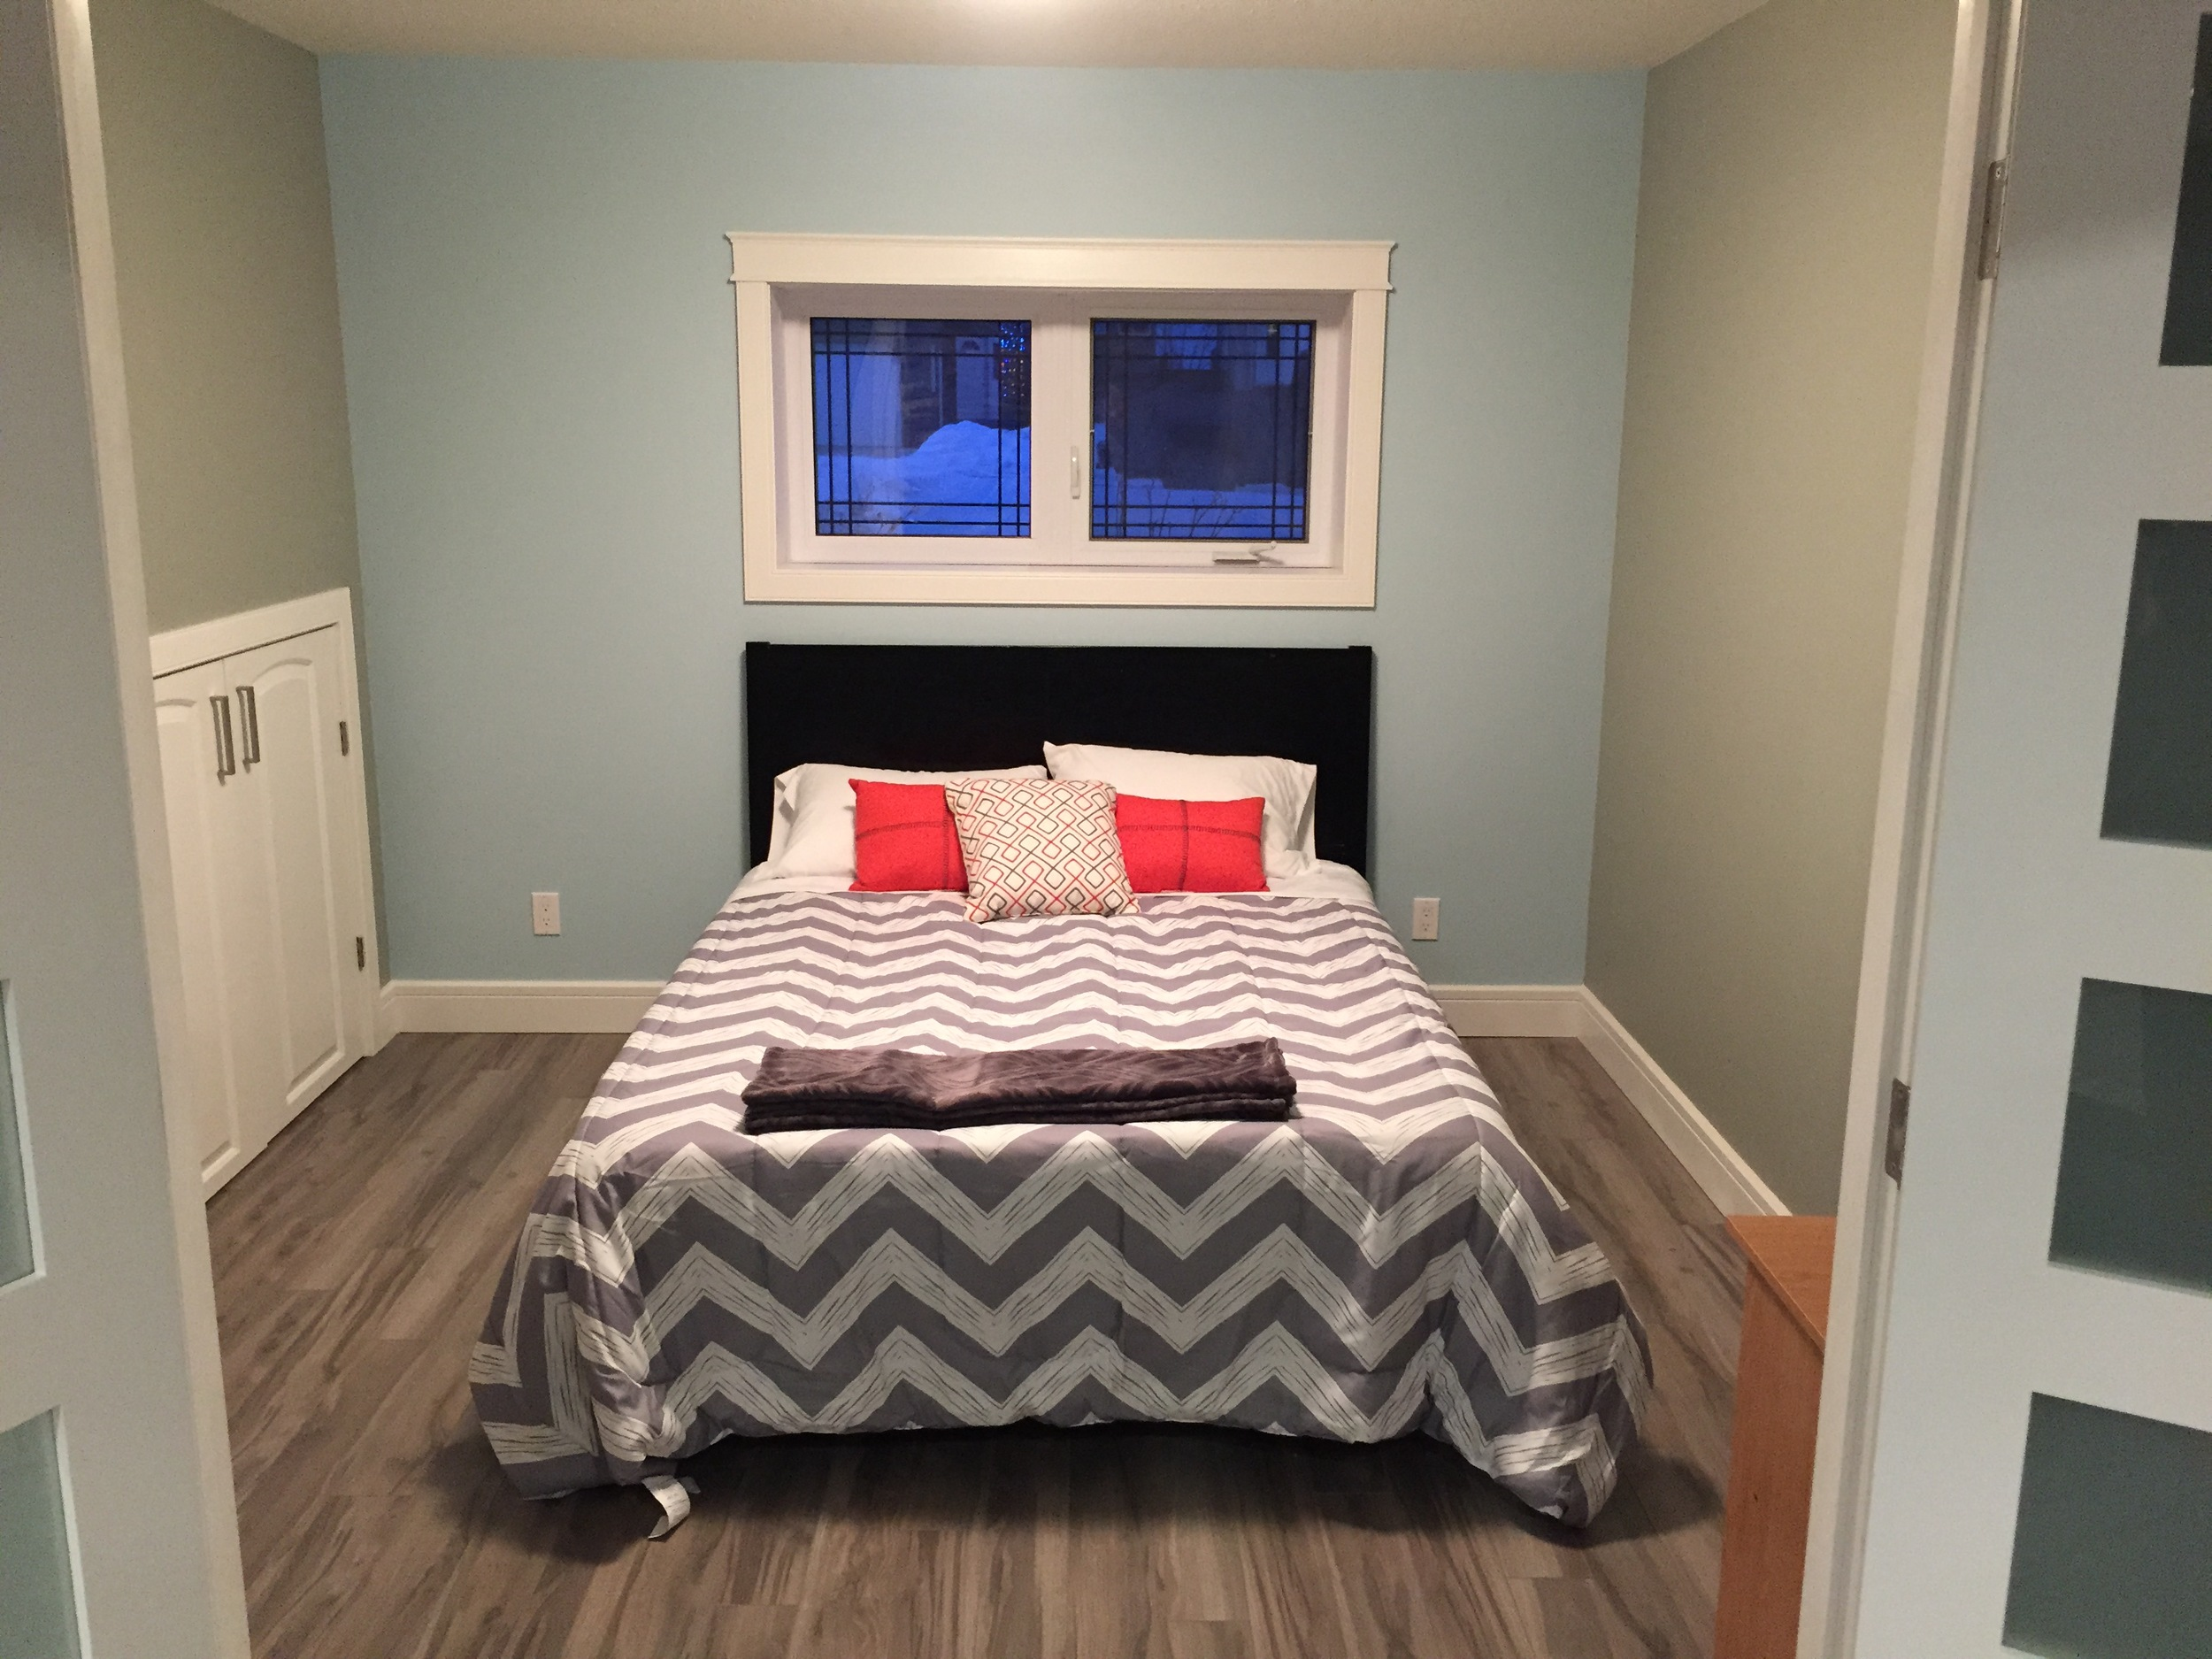 Basement renovation Saskatoon, bedroom, custom closet, french doors, trusted contractor